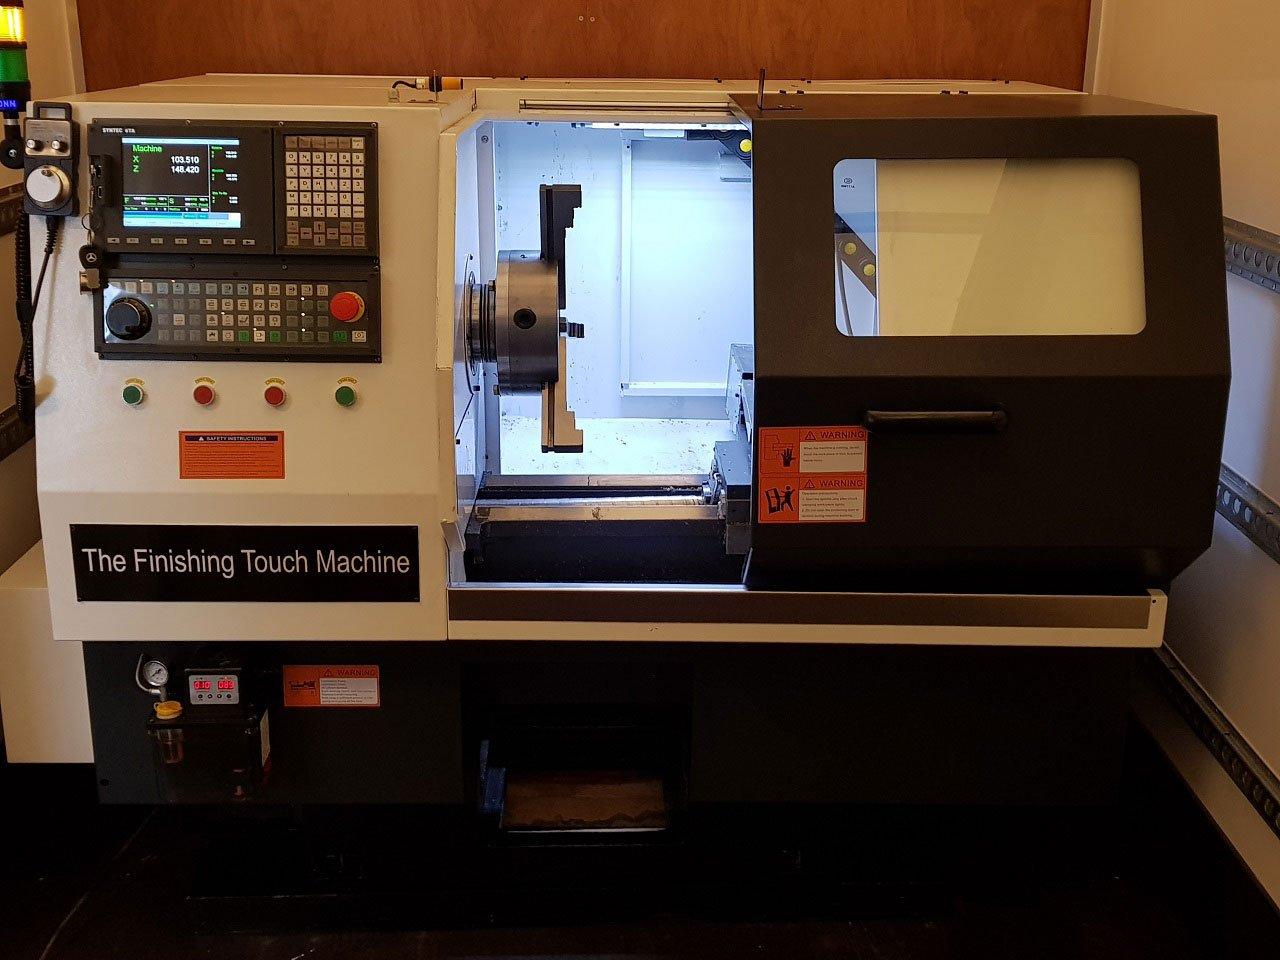 New Custom Built Mobile Diamond Cutting Machine Arrives - Finishing